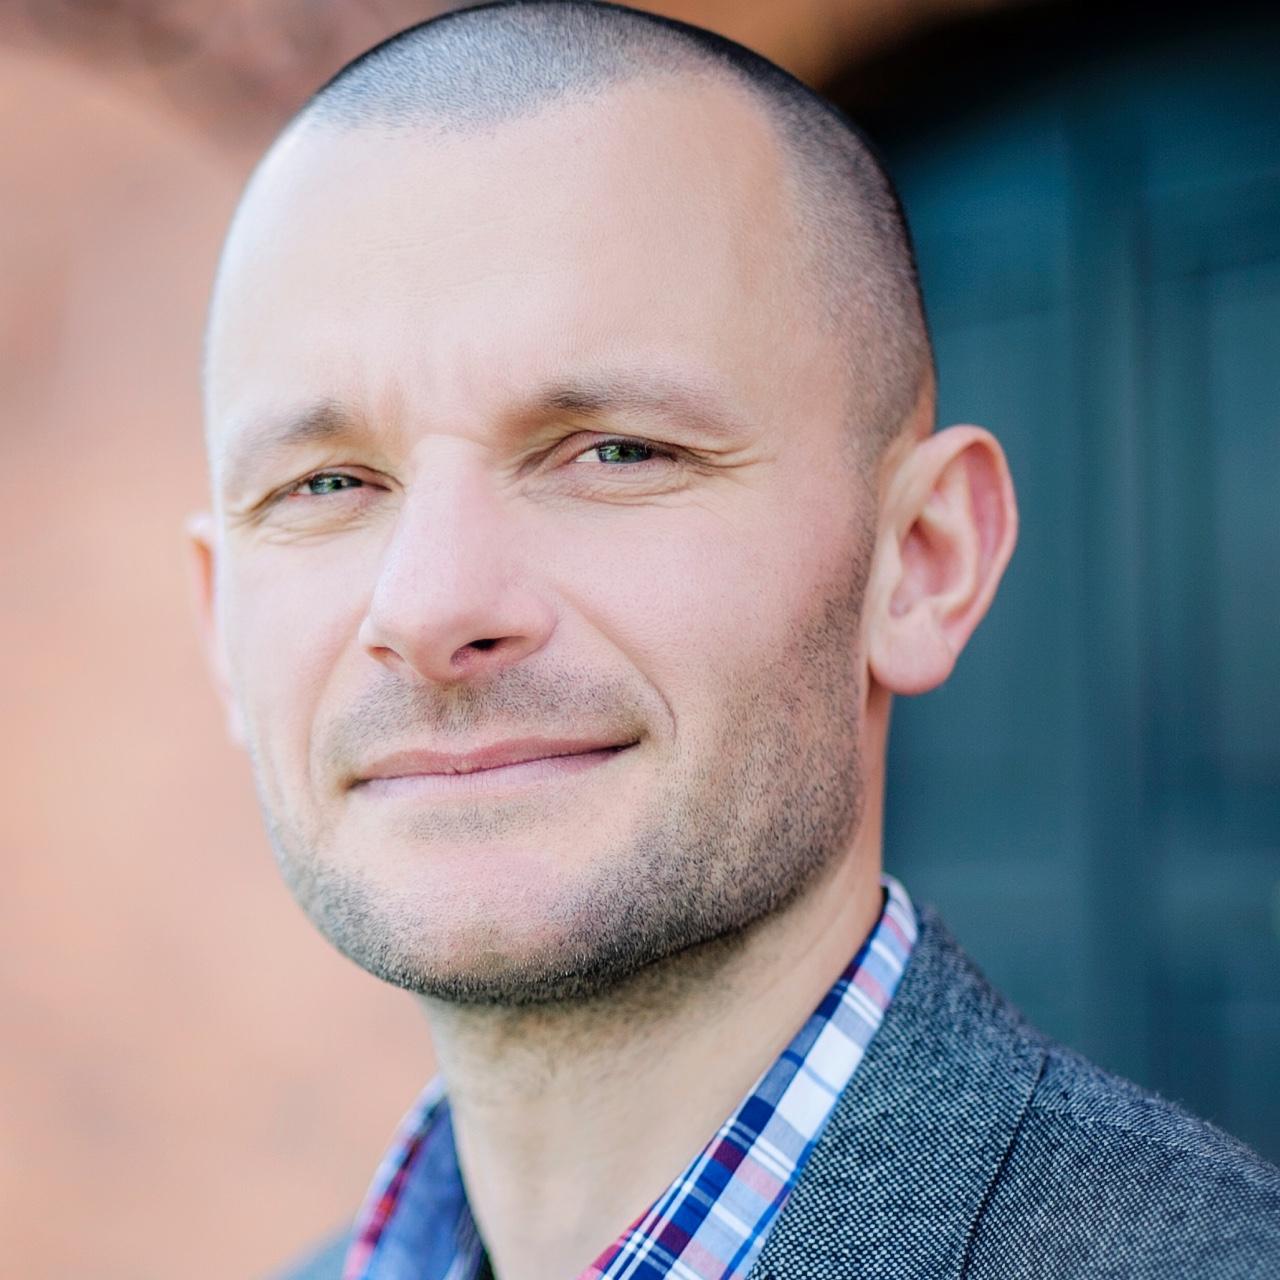 mediarun-zbigniew-nowicki-bluerank-managing-director